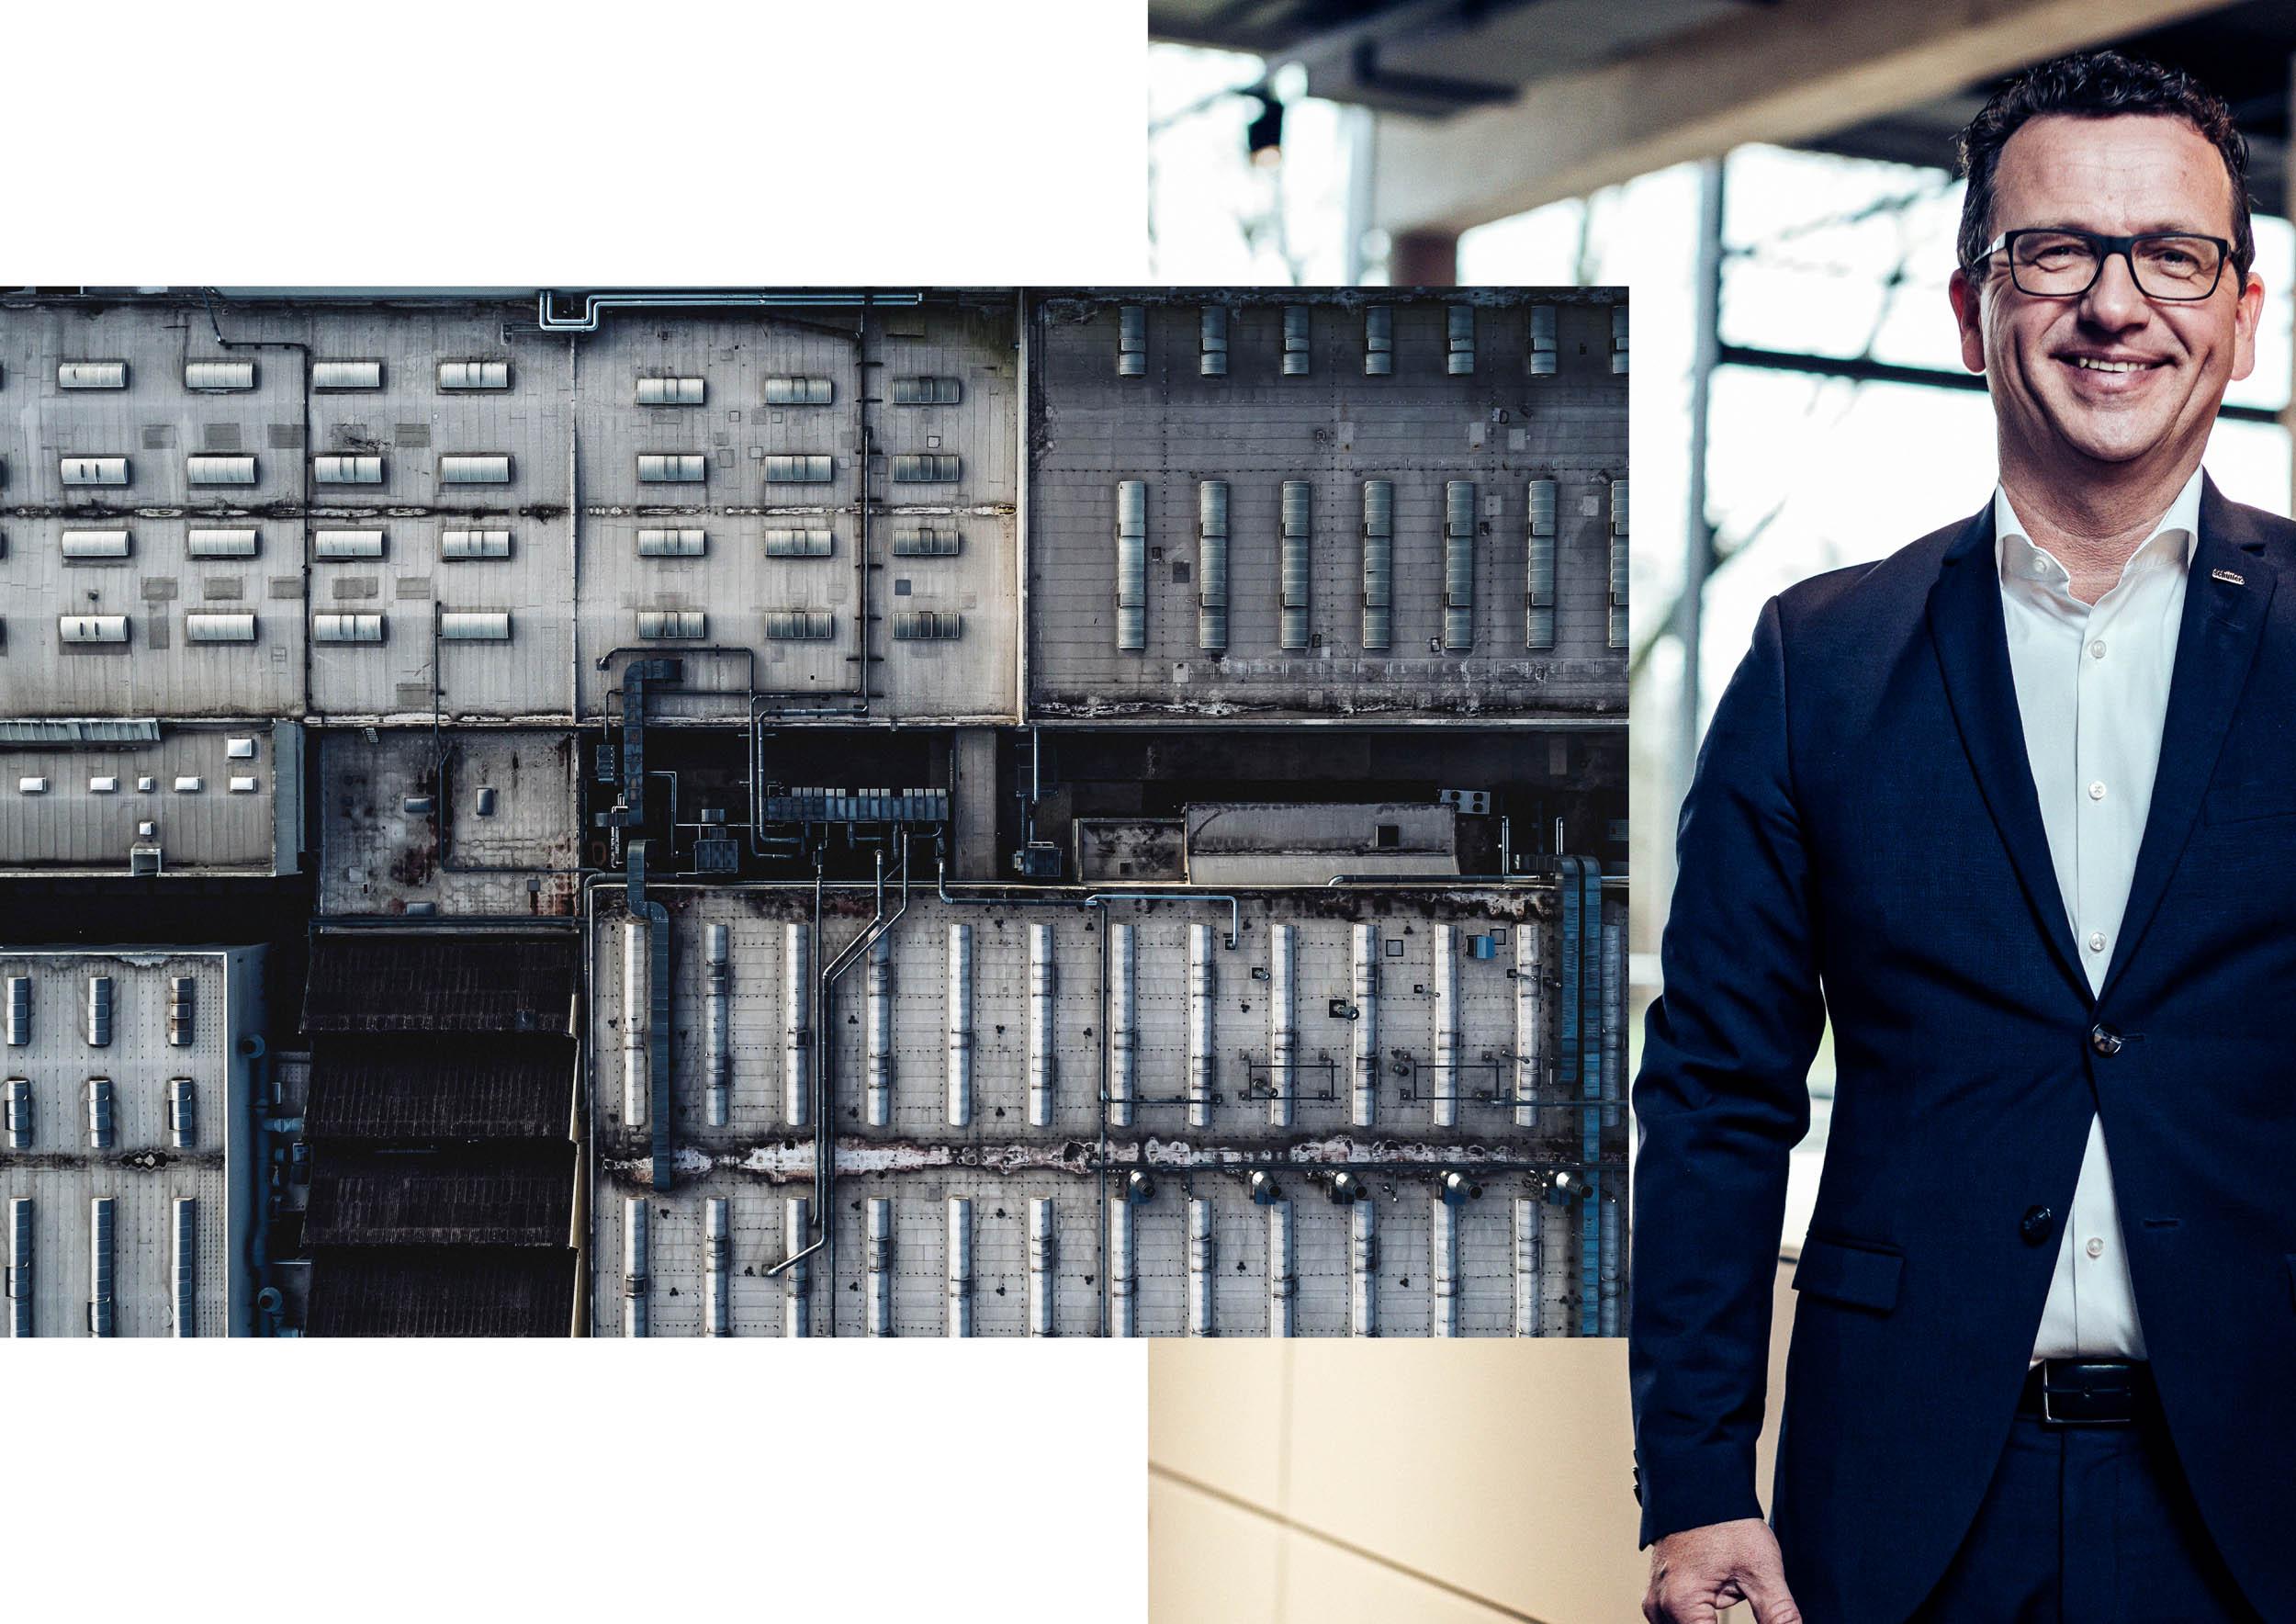 2018_SeifertUebler_schueller_kuechen_corporate_portrait_industrial_photography_013.jpg